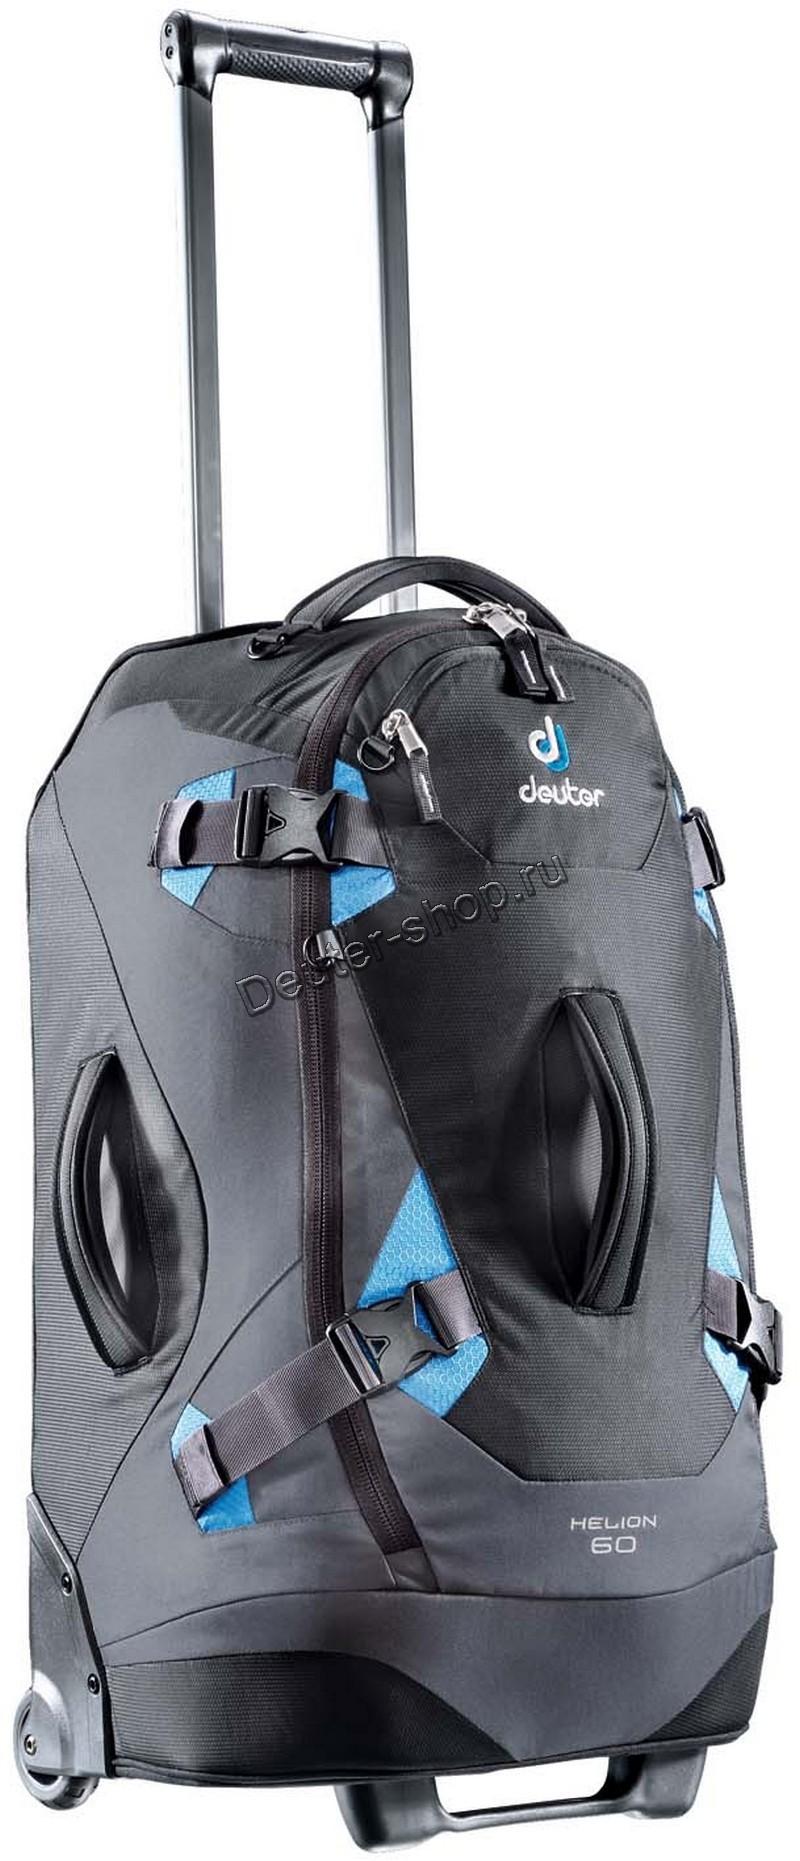 Сумки-рюкзаки Сумка на колесах Deuter Helion 60 Helion60_7302_12.jpg